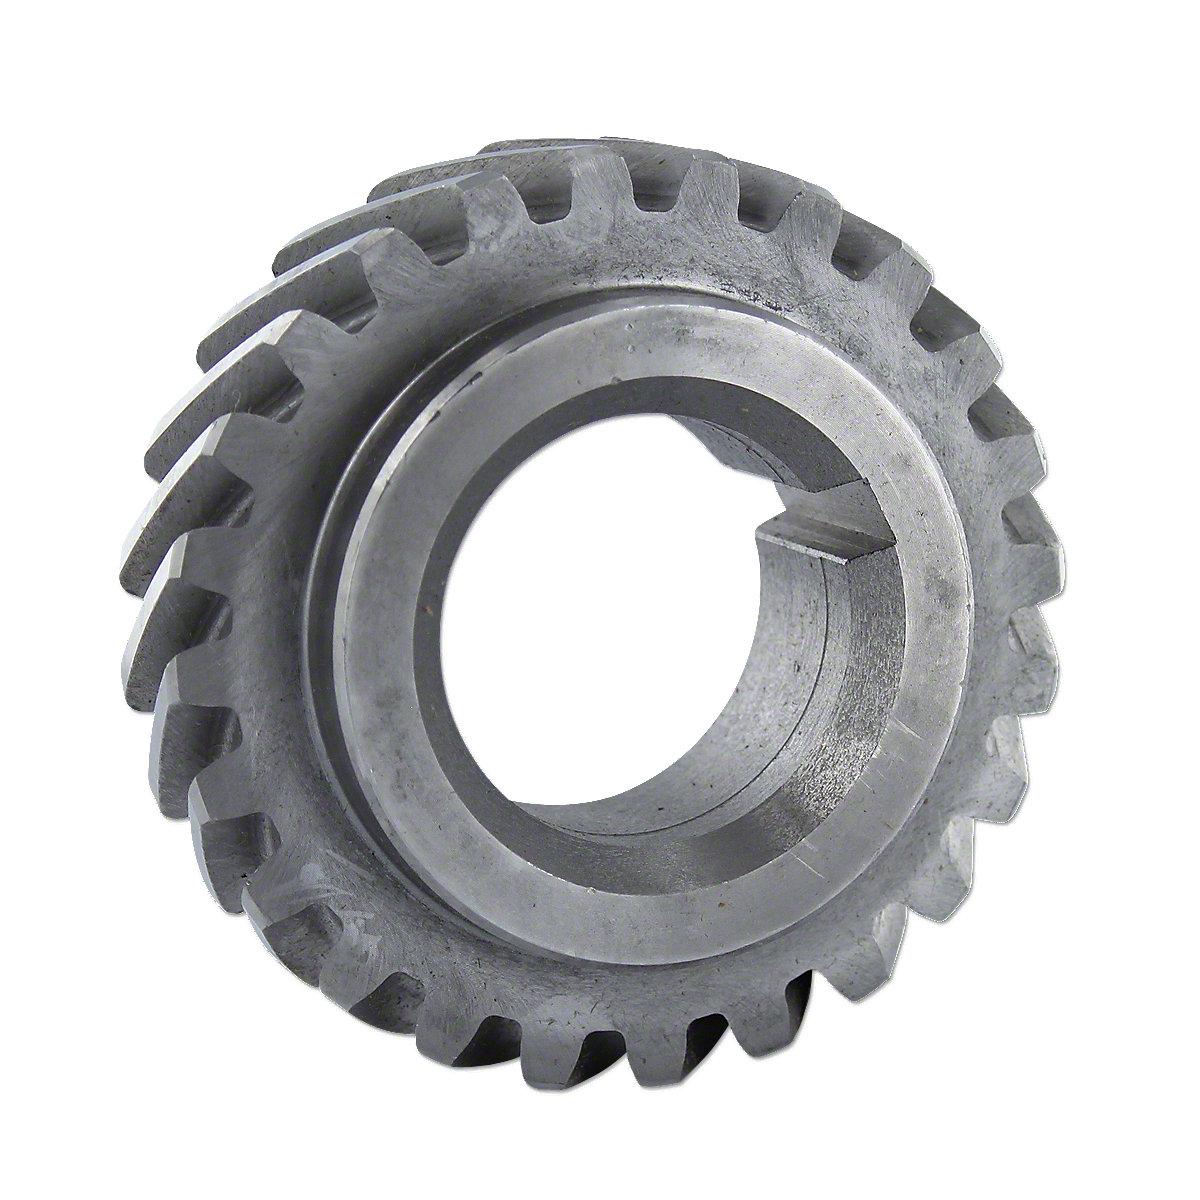 Crank Shaft Gear For Massey Ferguson: 35, 135, 150, 20C, 230, 235, 245, 30B, 40, TO35.